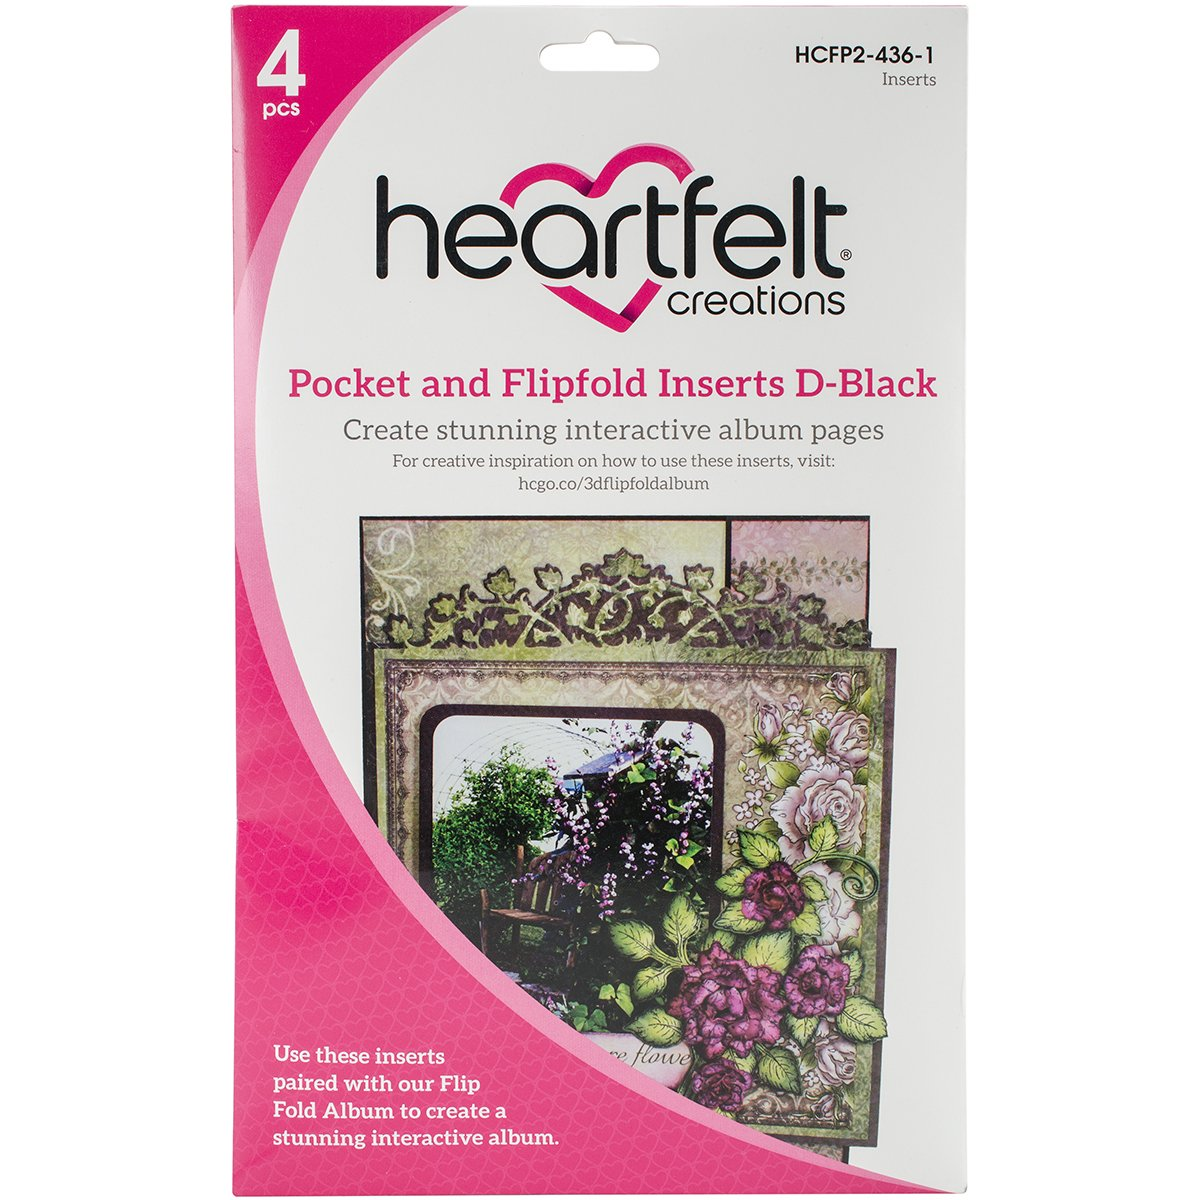 Heartfelt Creations D-Black Flipfold Inserts